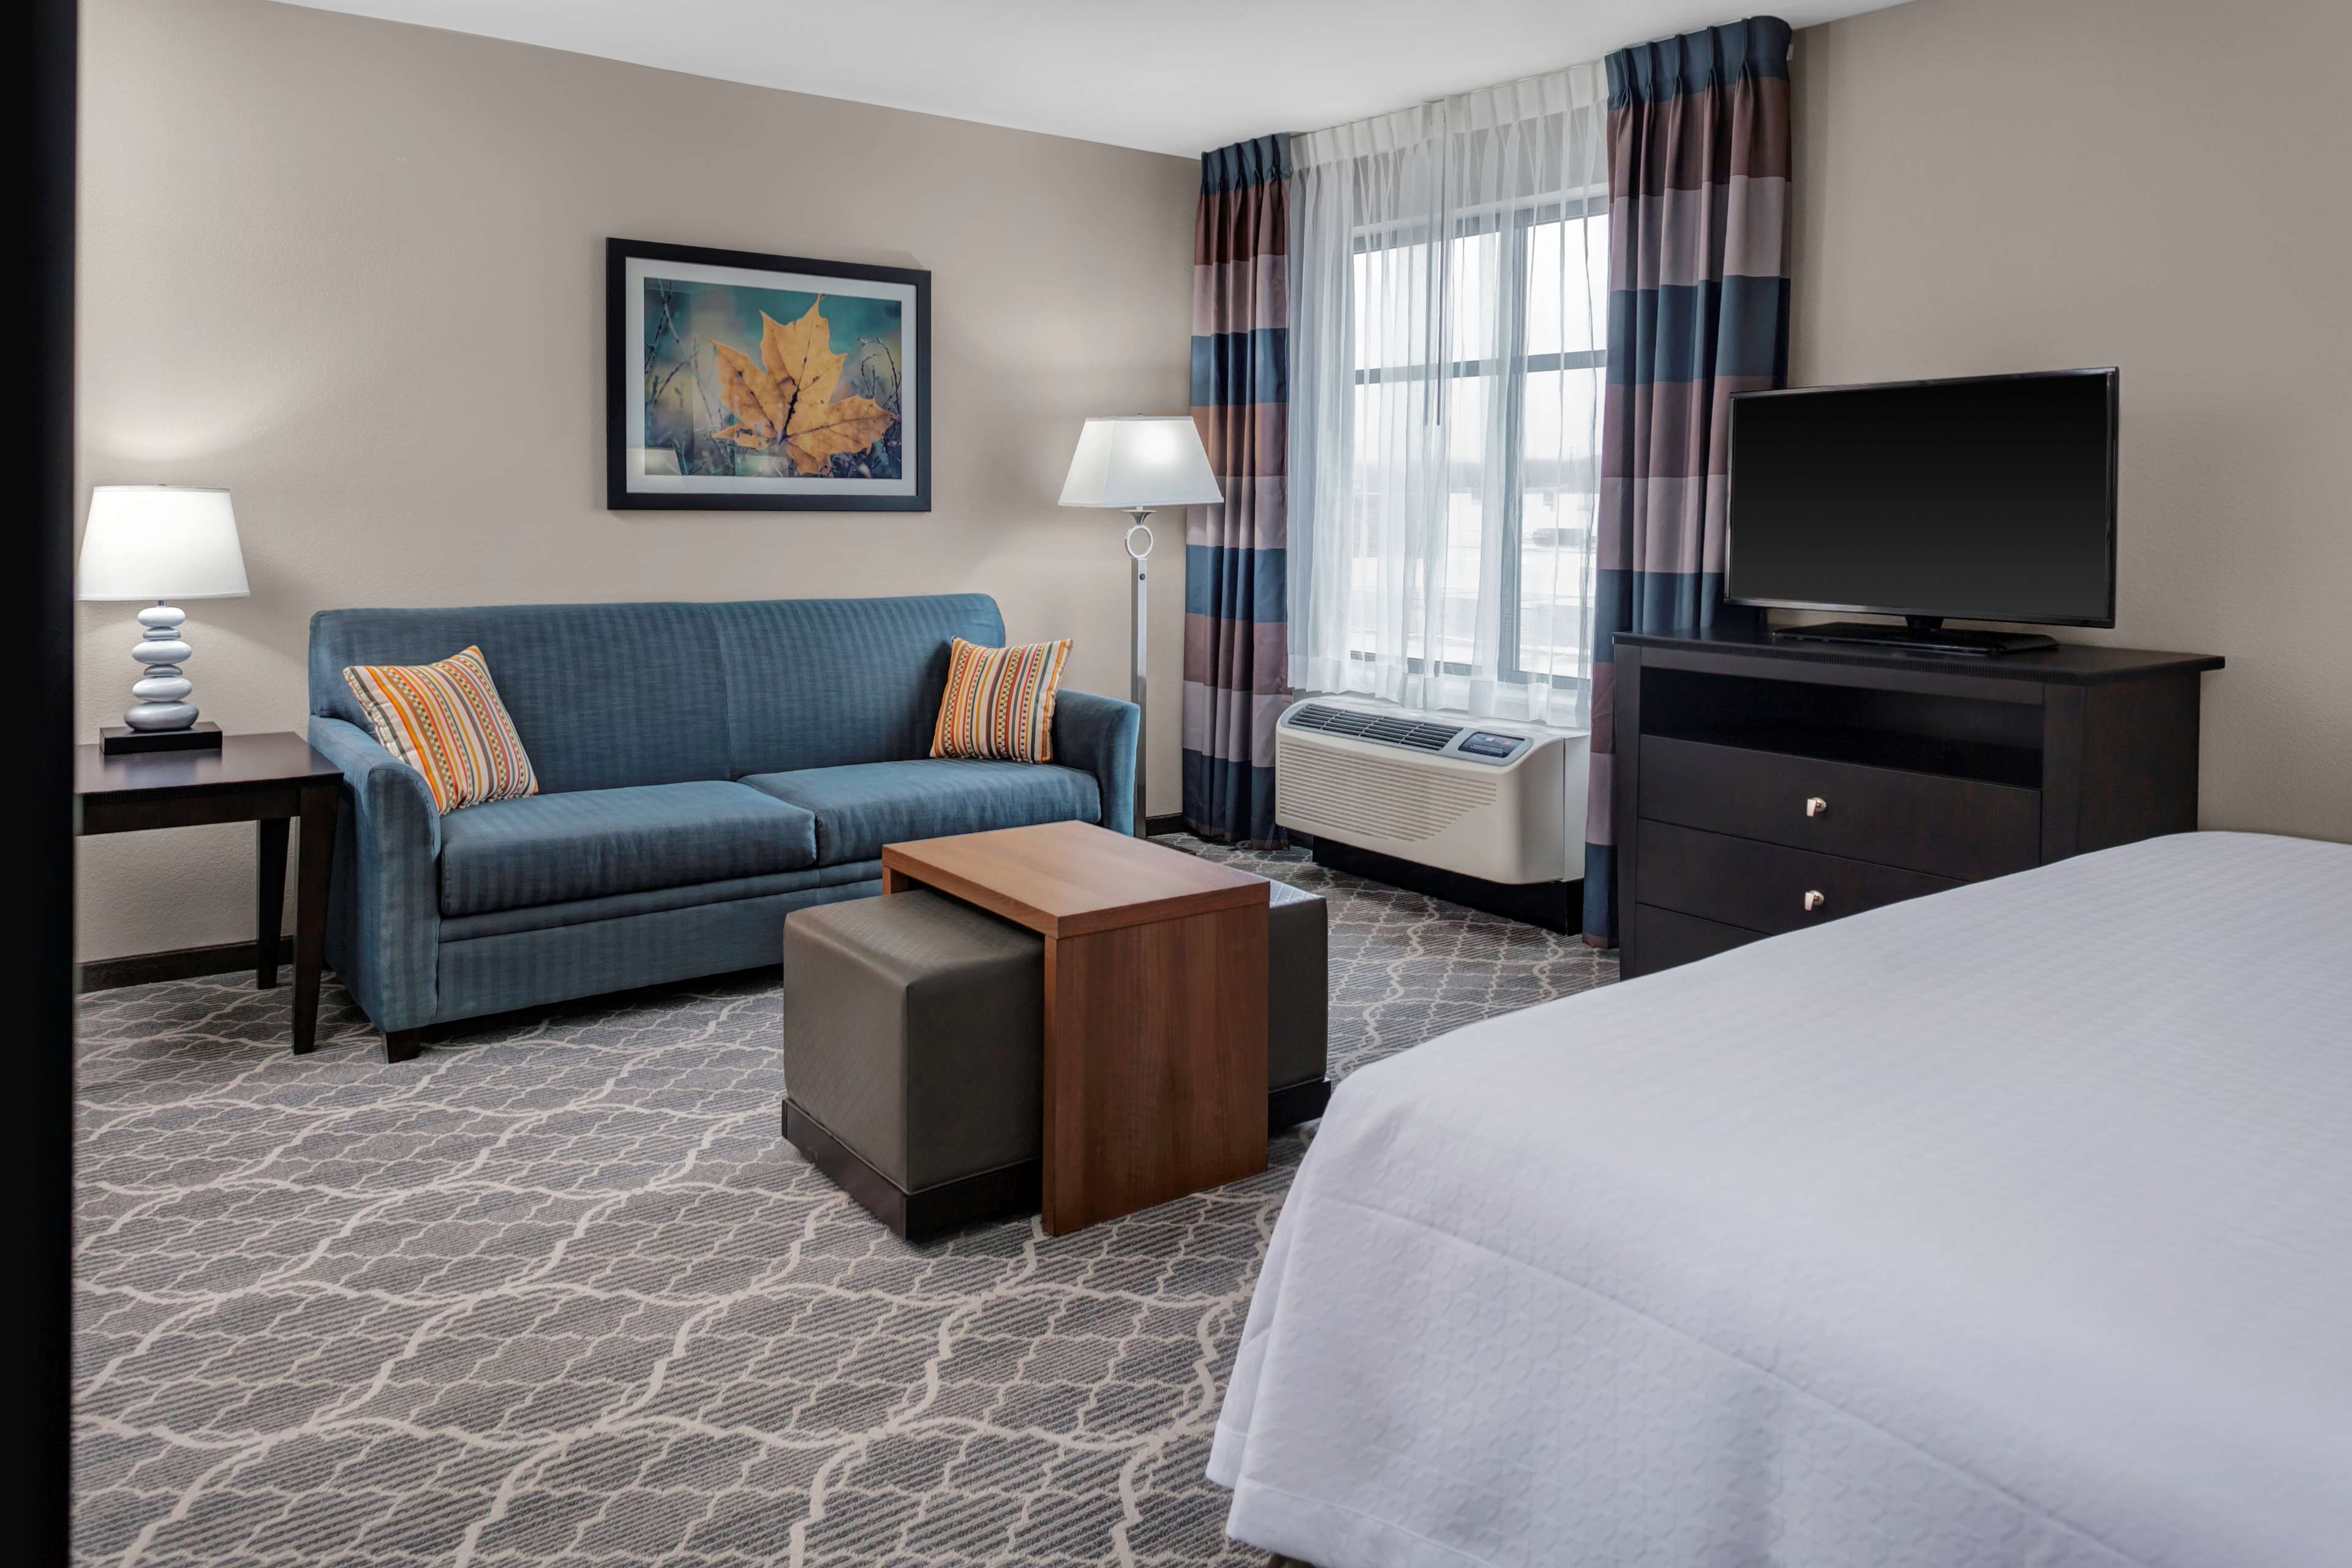 Homewood Suites by Hilton Wauwatosa Milwaukee image 12